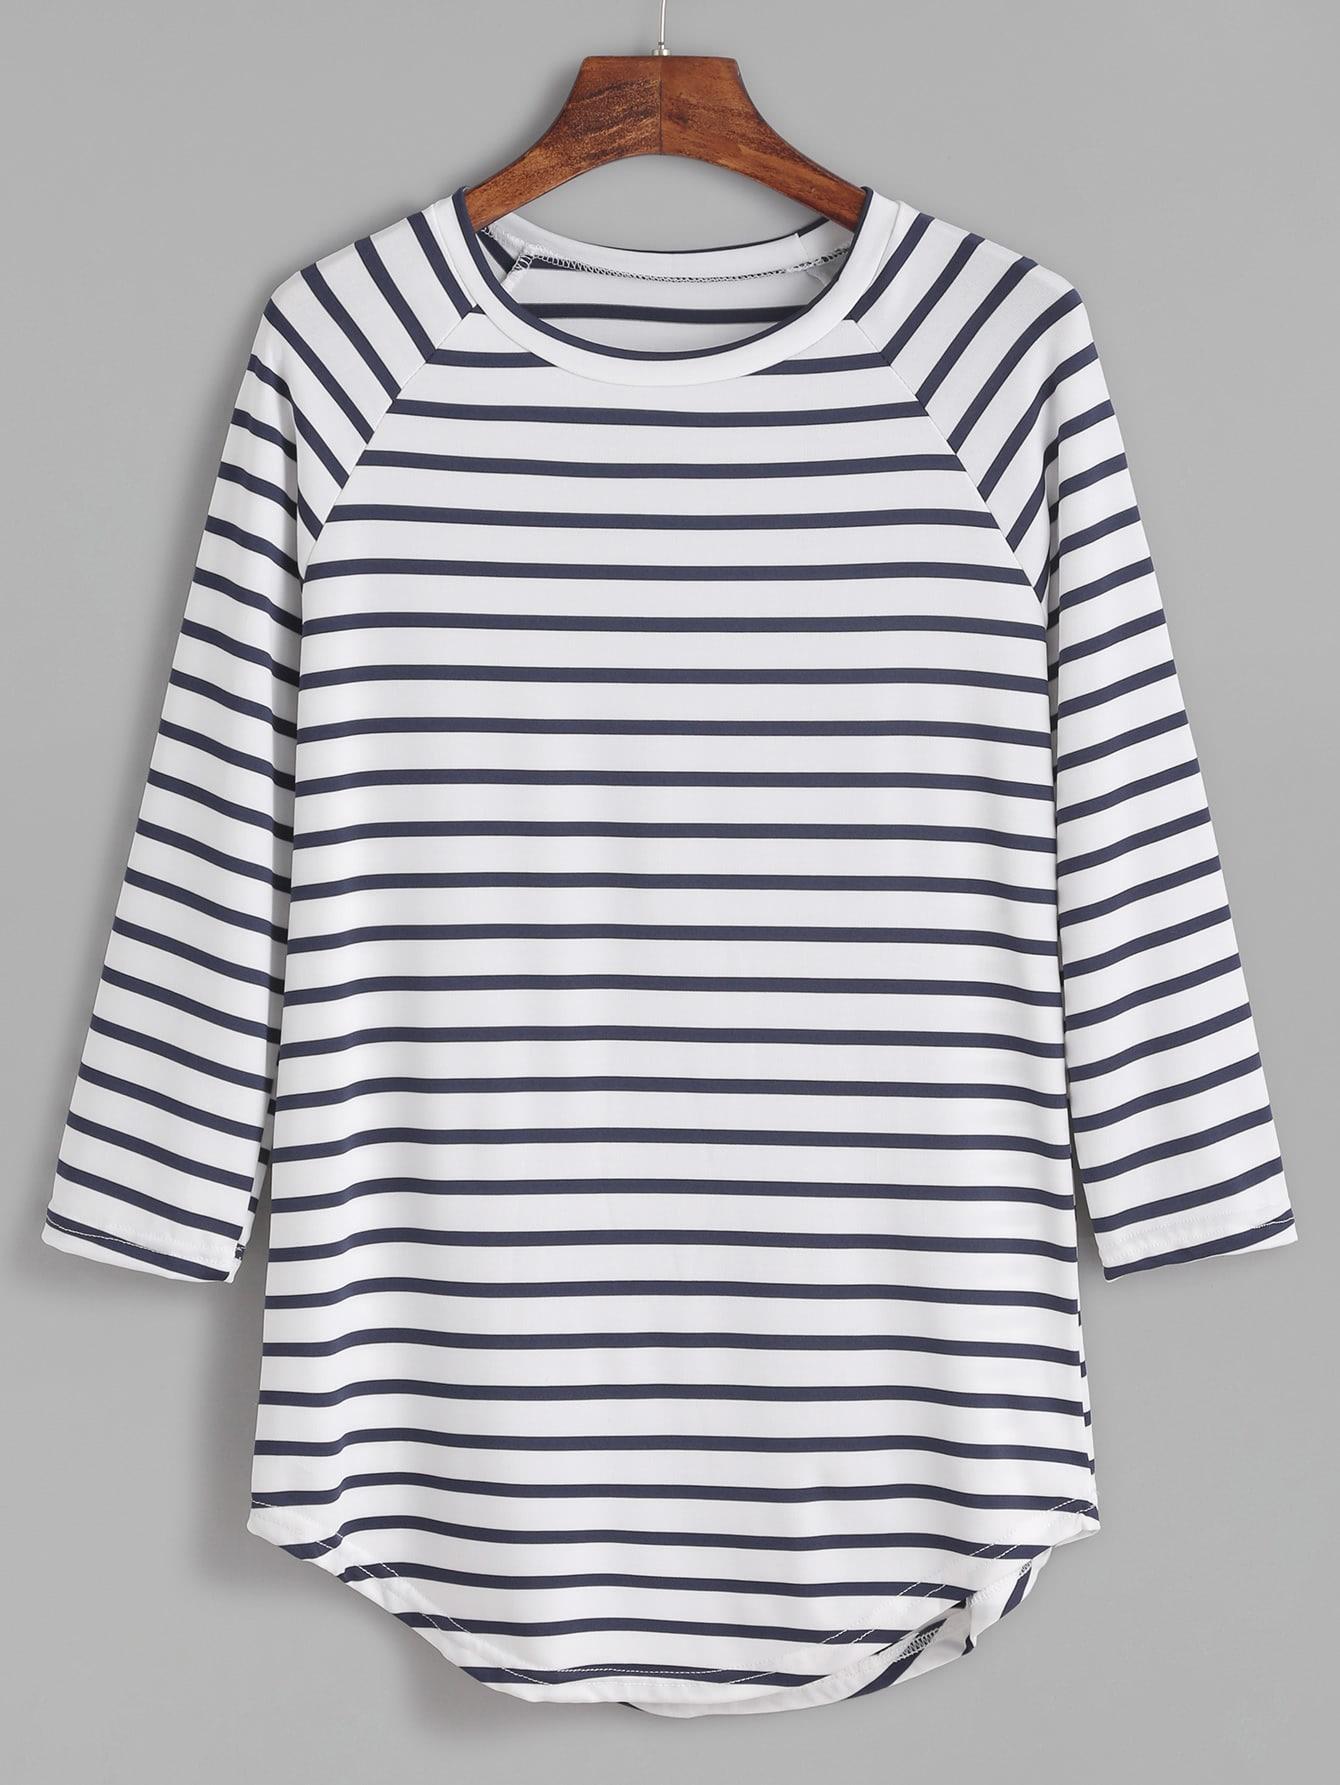 Contrast Striped Raglan Sleeve Curved Hem T-shirt striped elbow patch curved hem t shirt